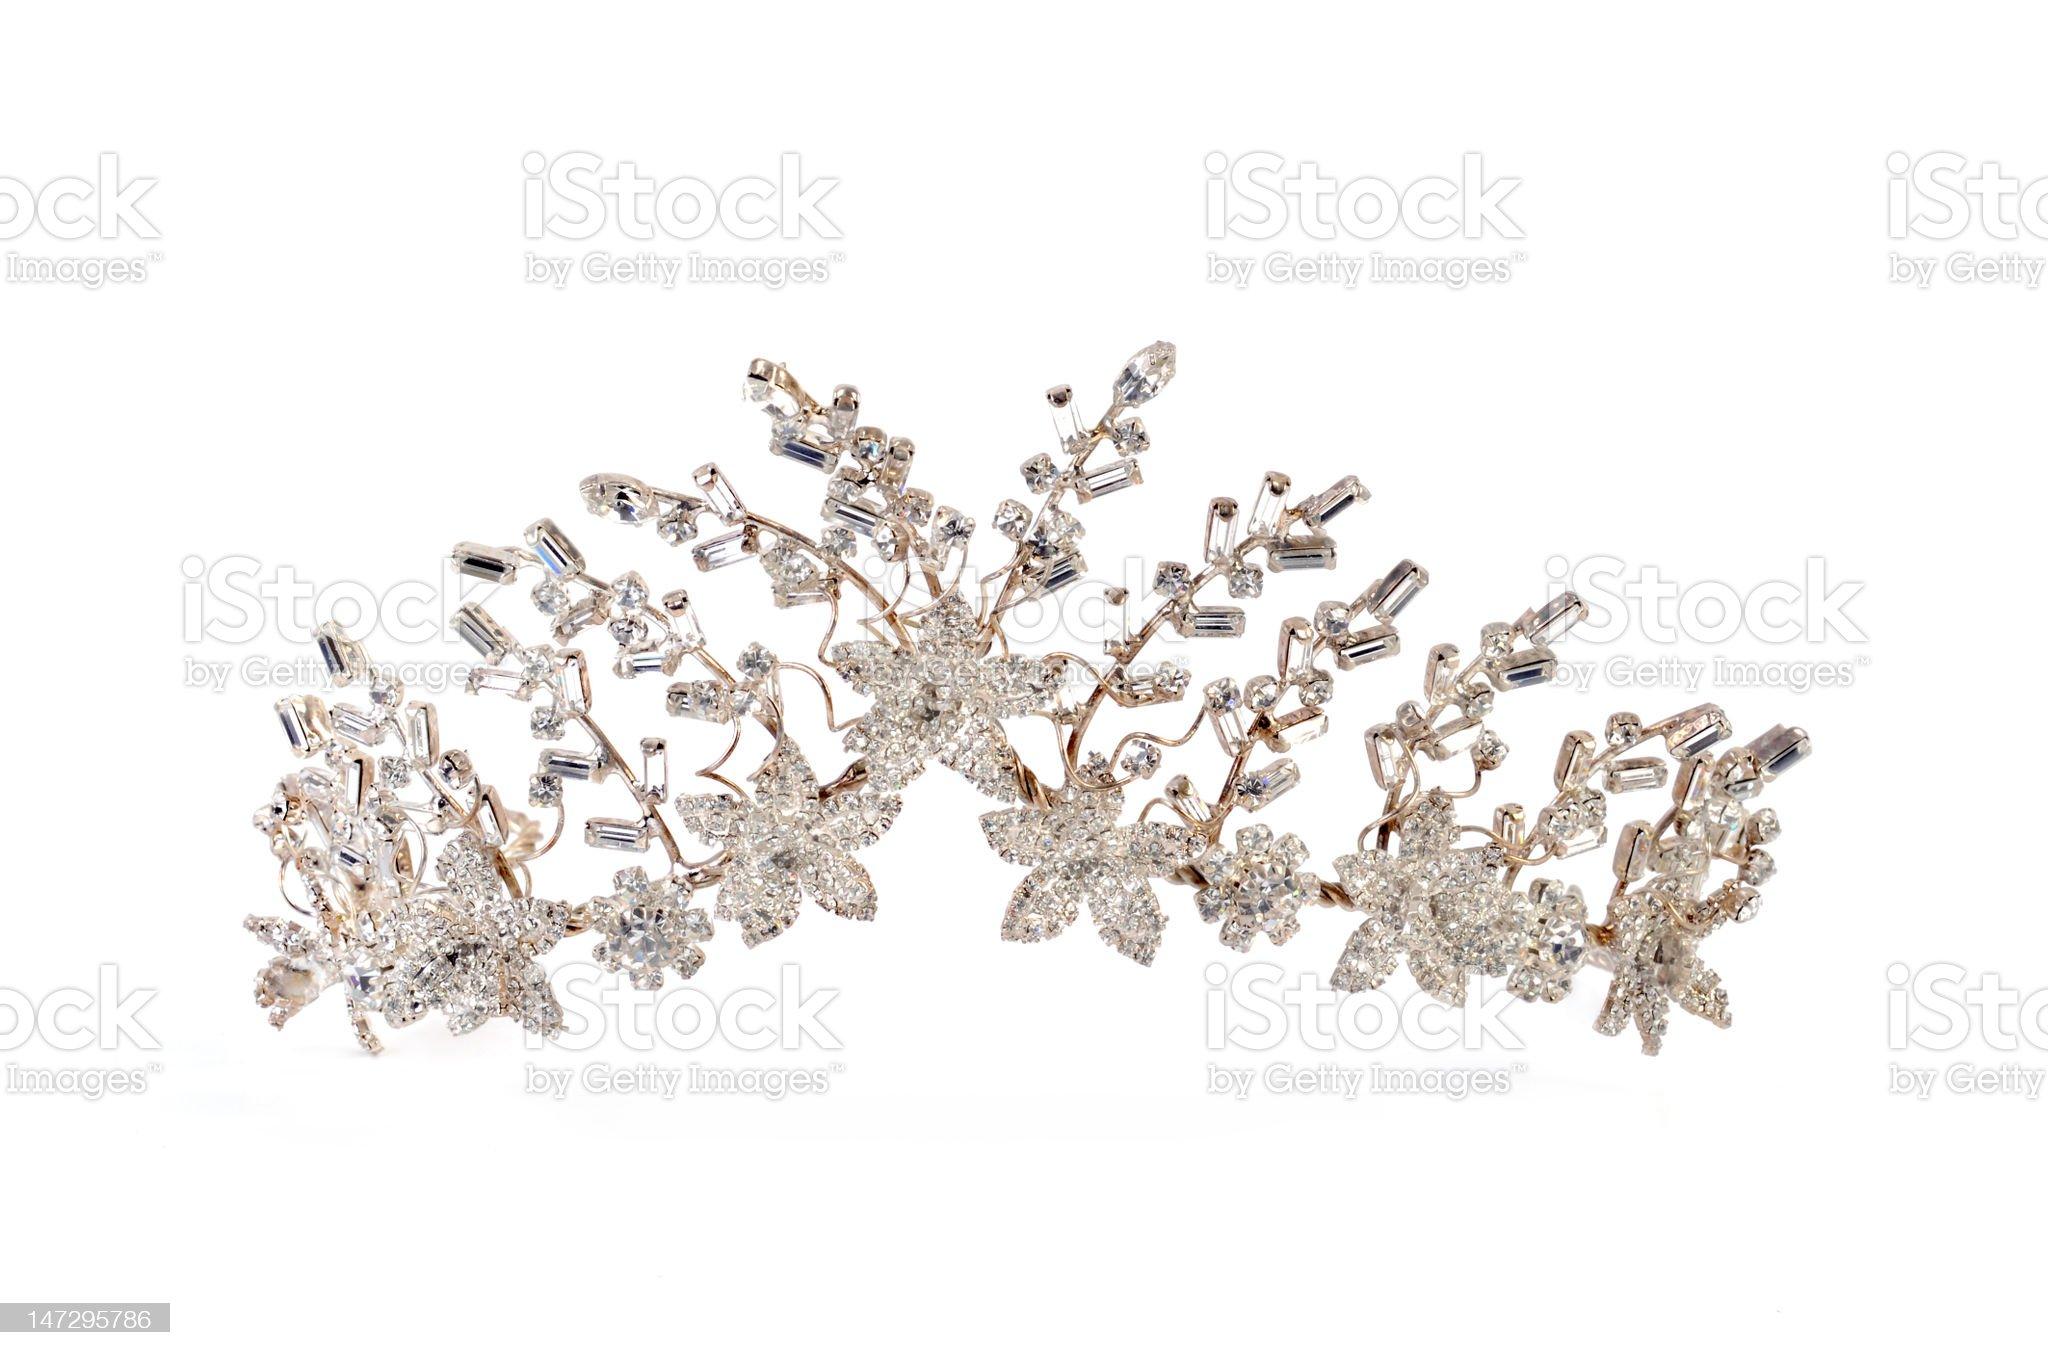 Platinum tiara isolated on a white background royalty-free stock photo